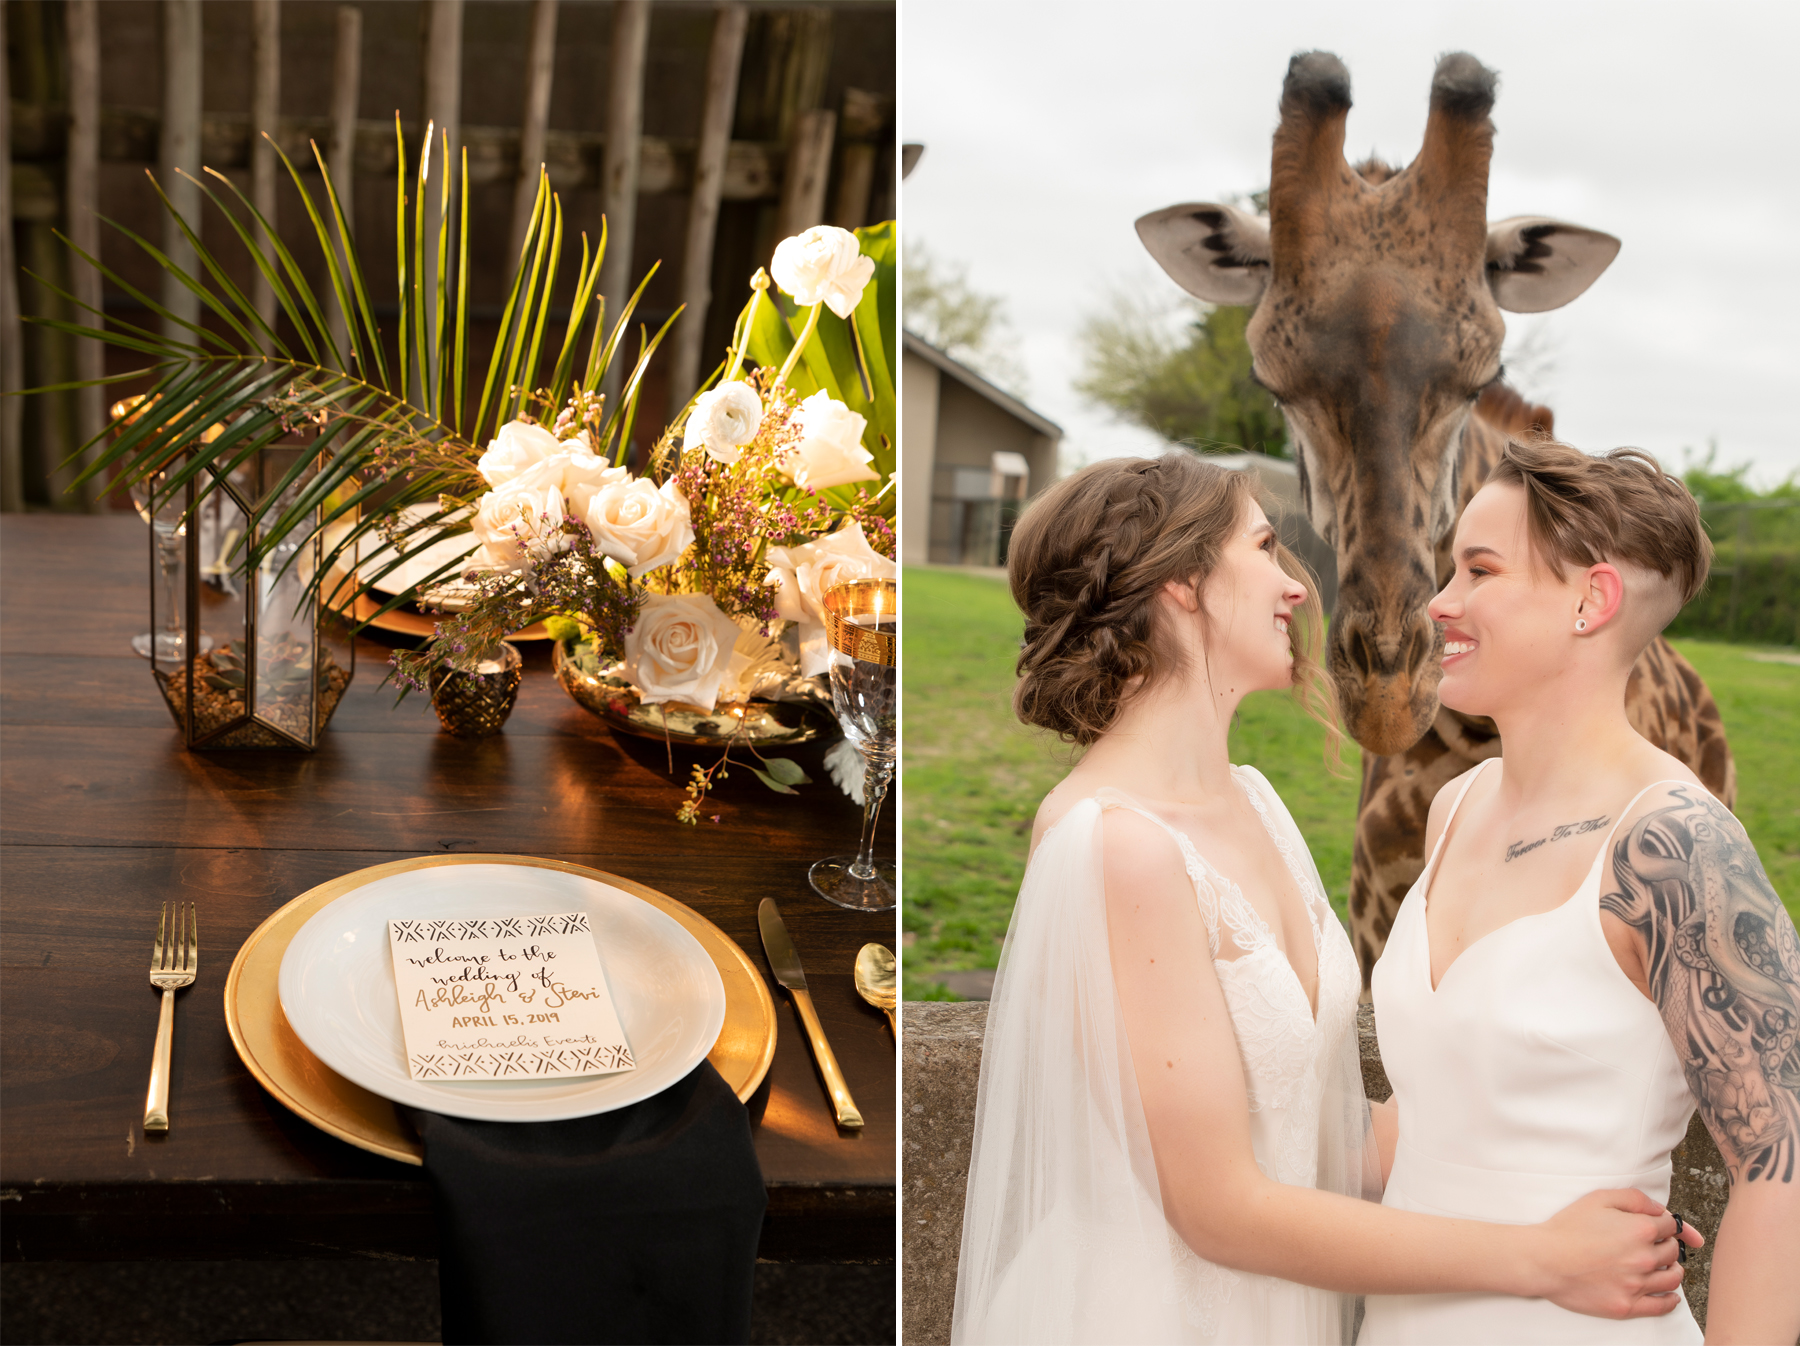 Wedding-Tablescape-Louisville-Zoo-LGBTQ-Wedding-Couture-Closet